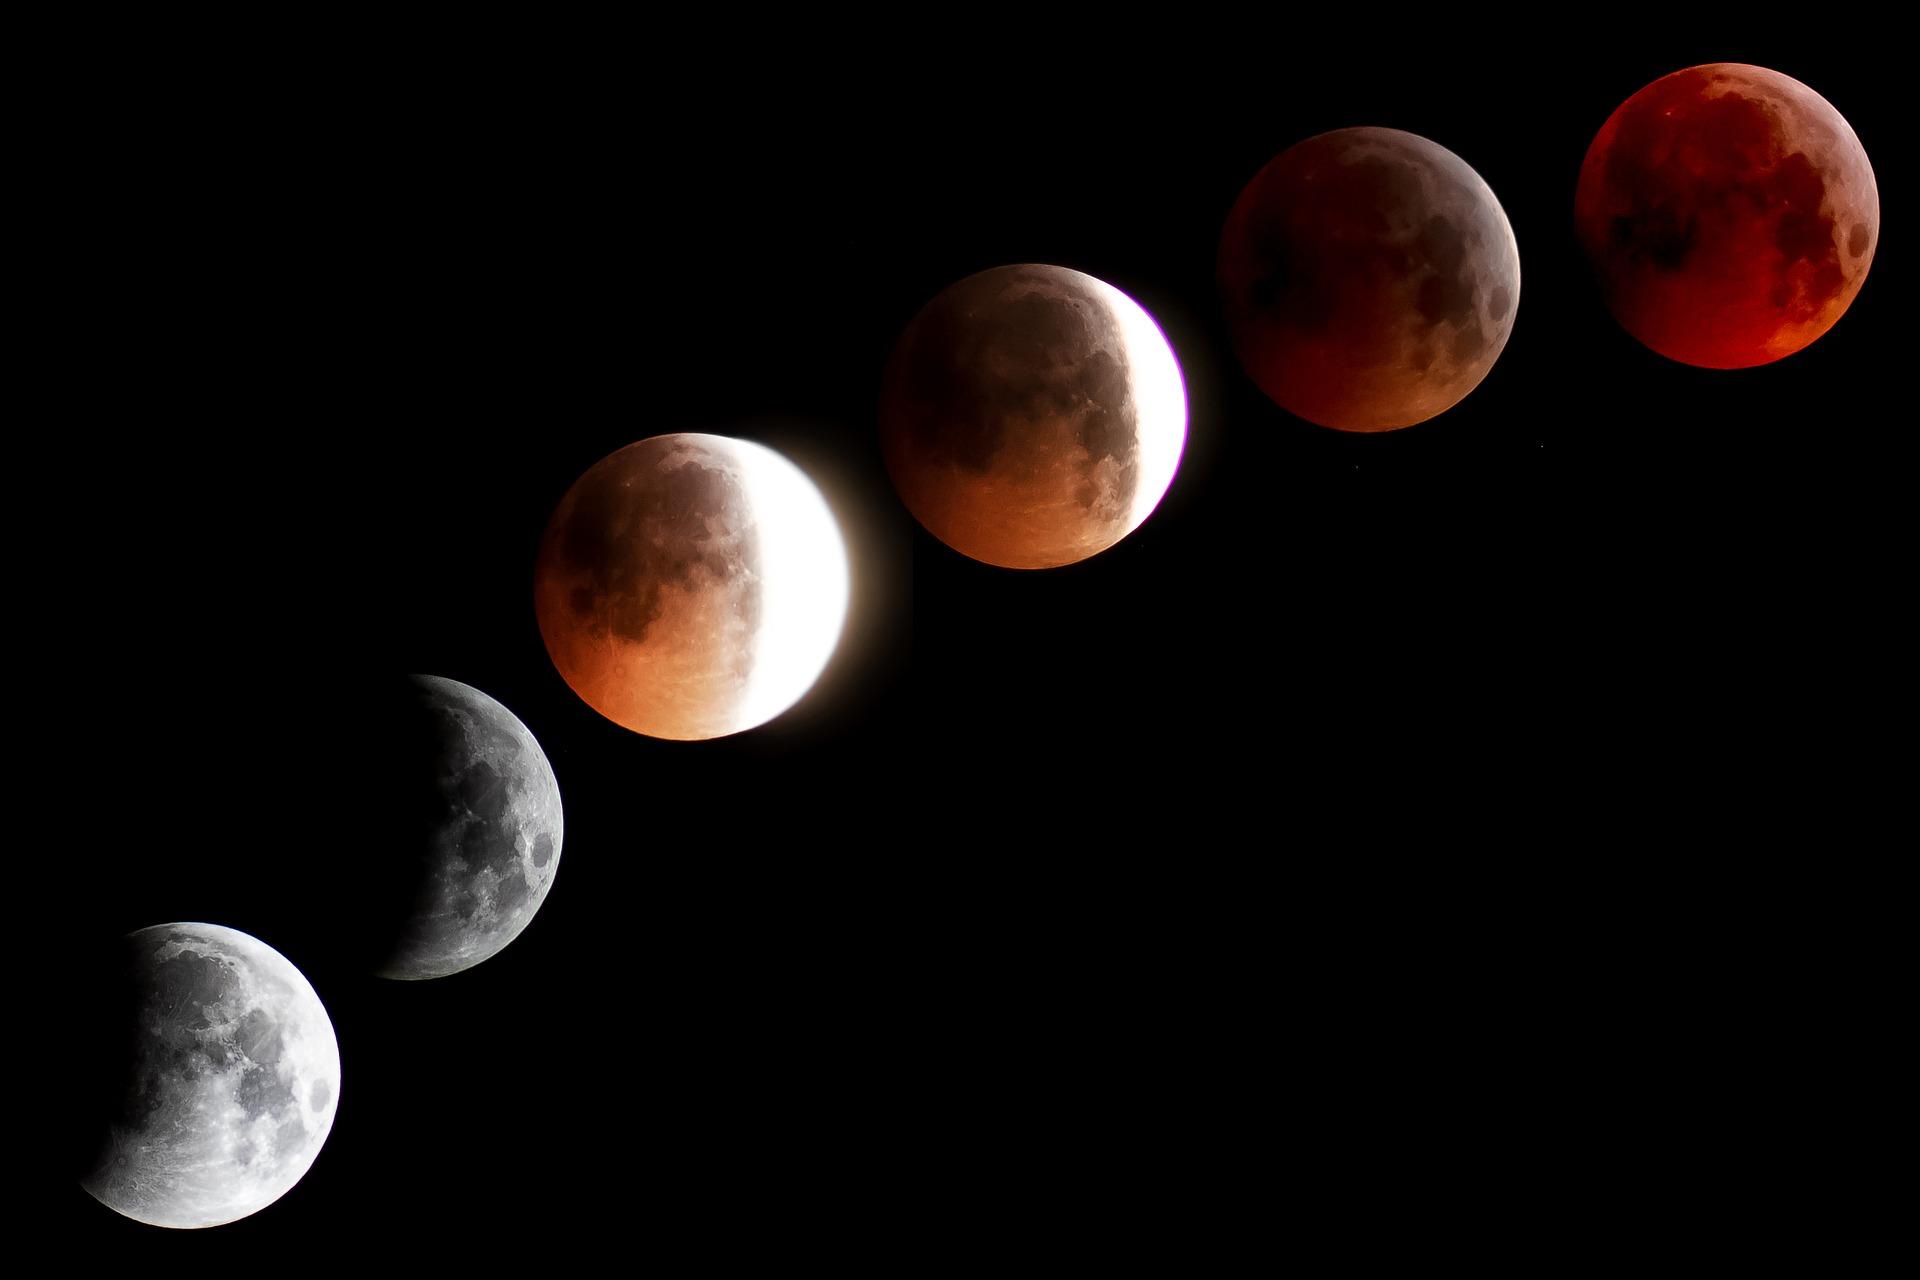 Fenomene astronomice - Luna plina